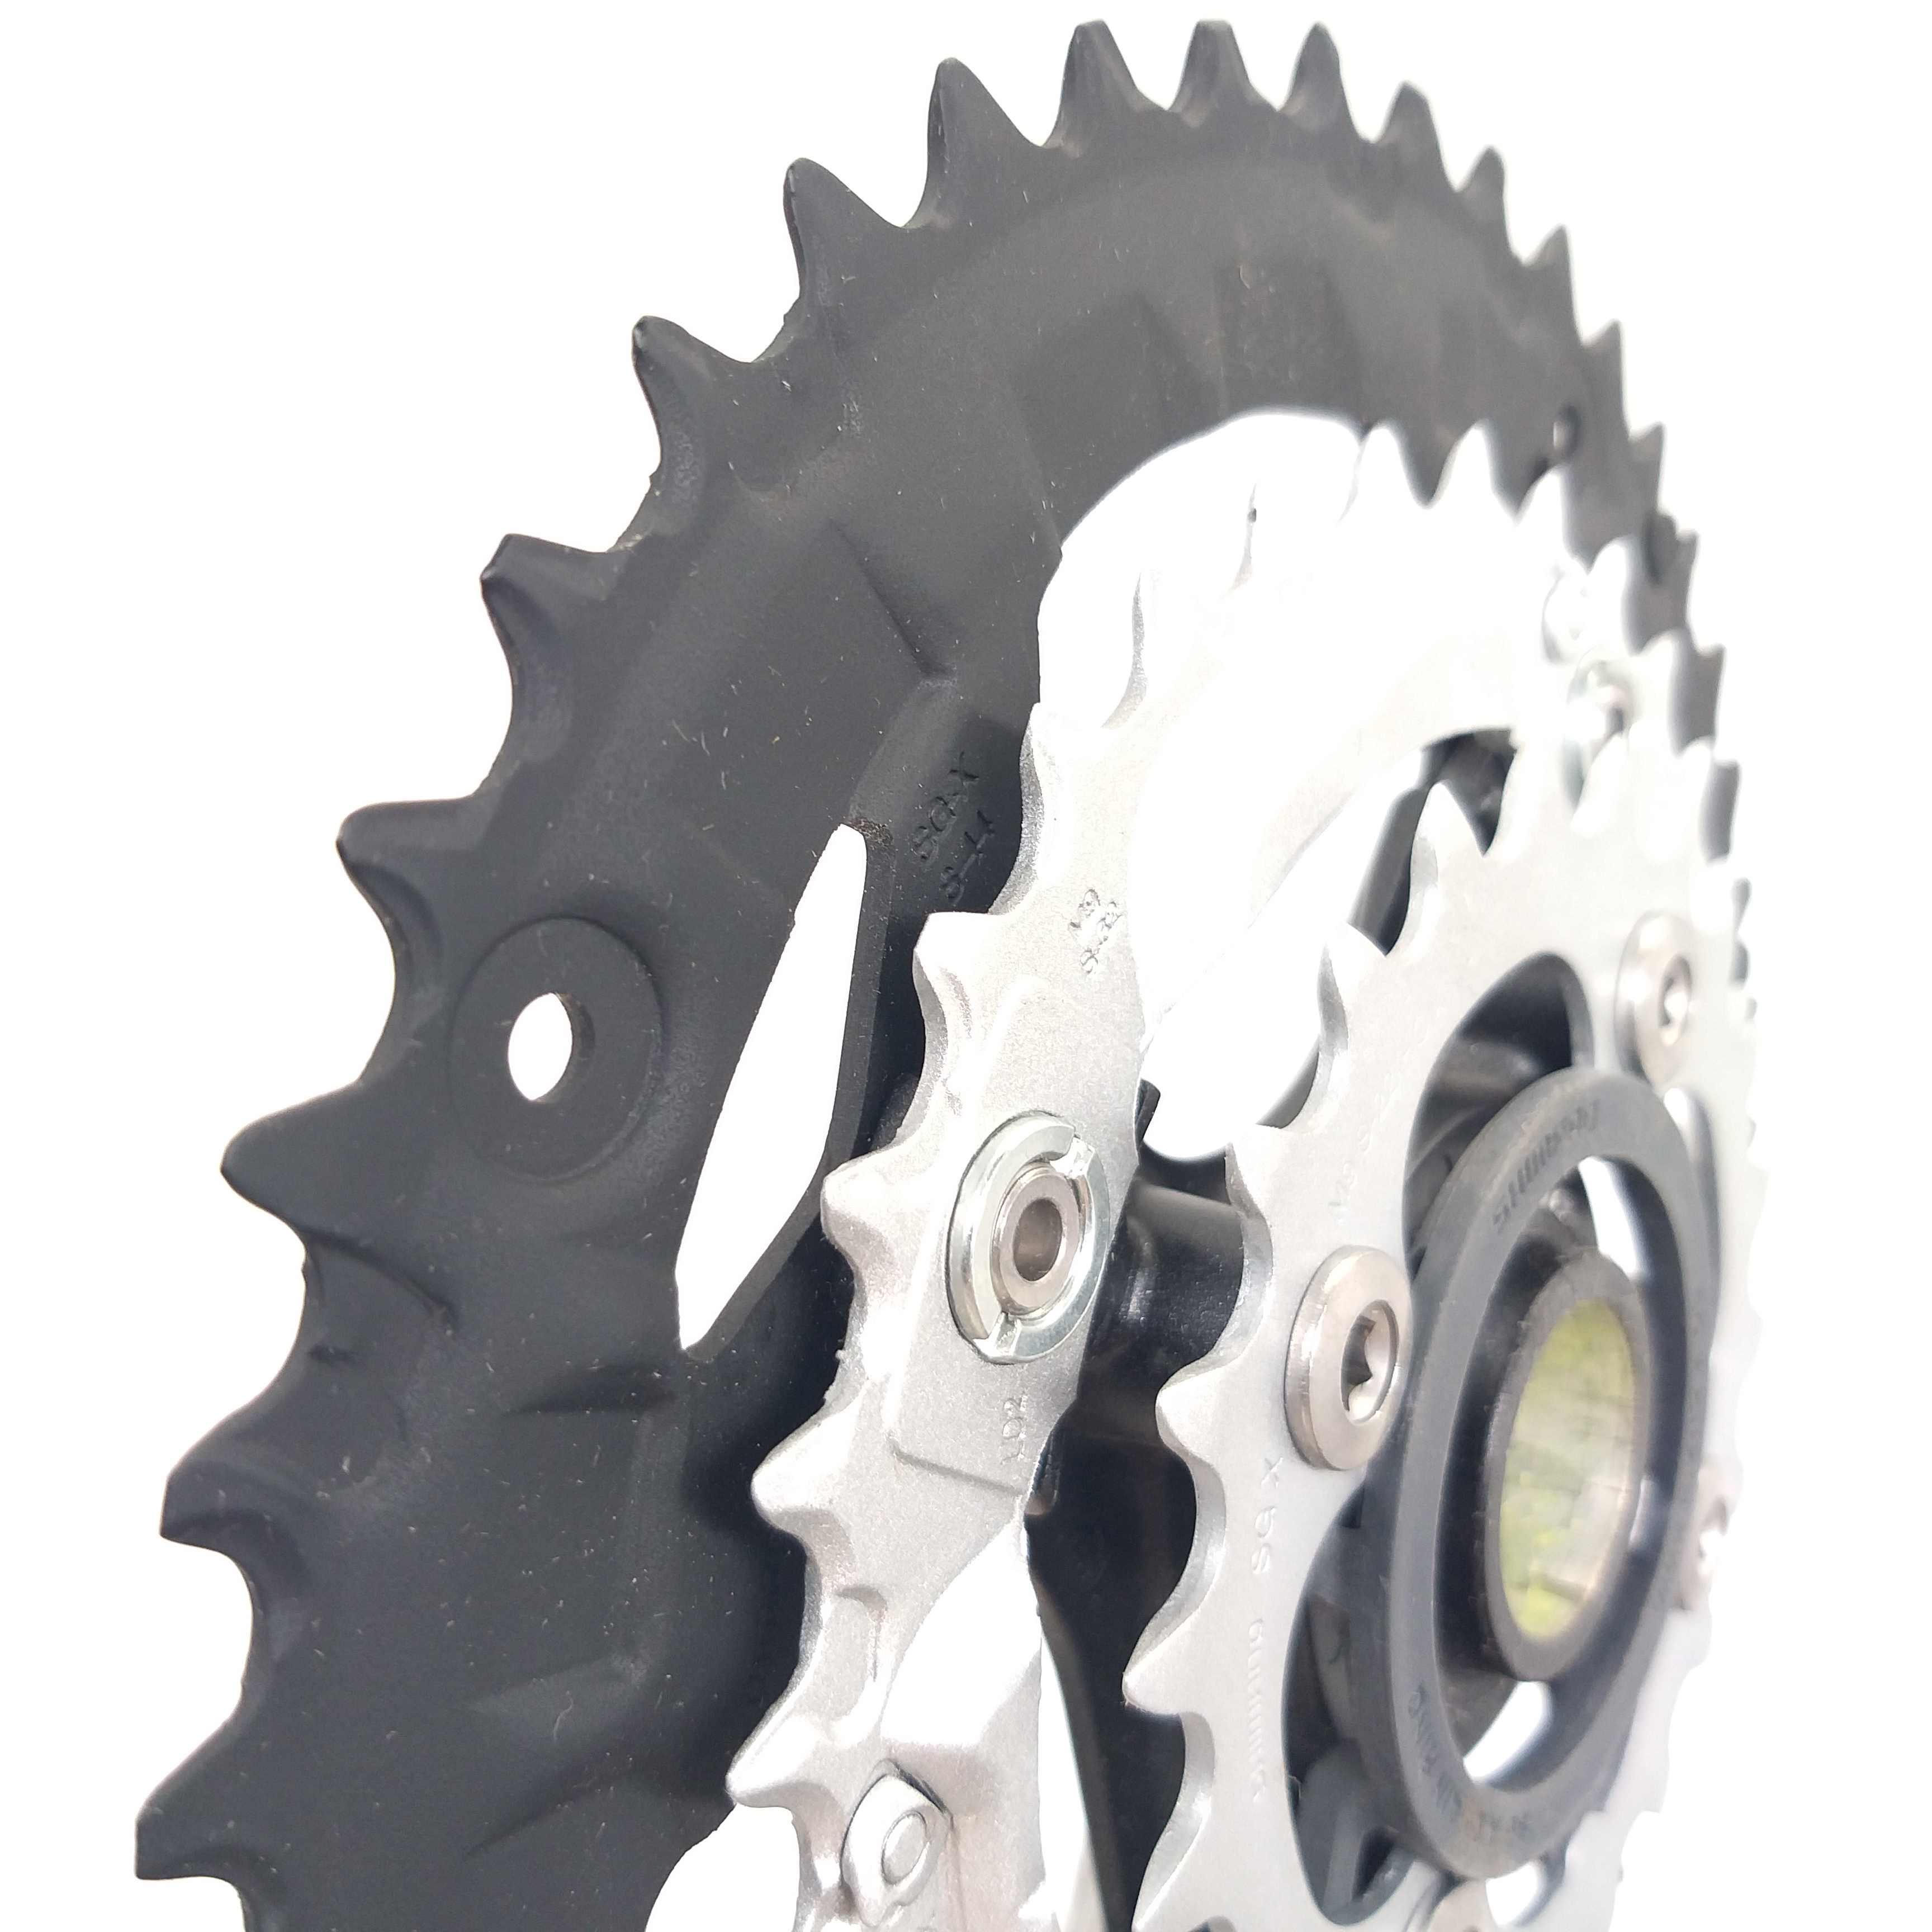 Shimano alivio fc m430 m4000 44-32-22t 22-30-40t 자전거 크랭크 셋 9 속도 44 t 40 t mtb 자전거 체인 휠 (es25 하단 브래킷 포함)